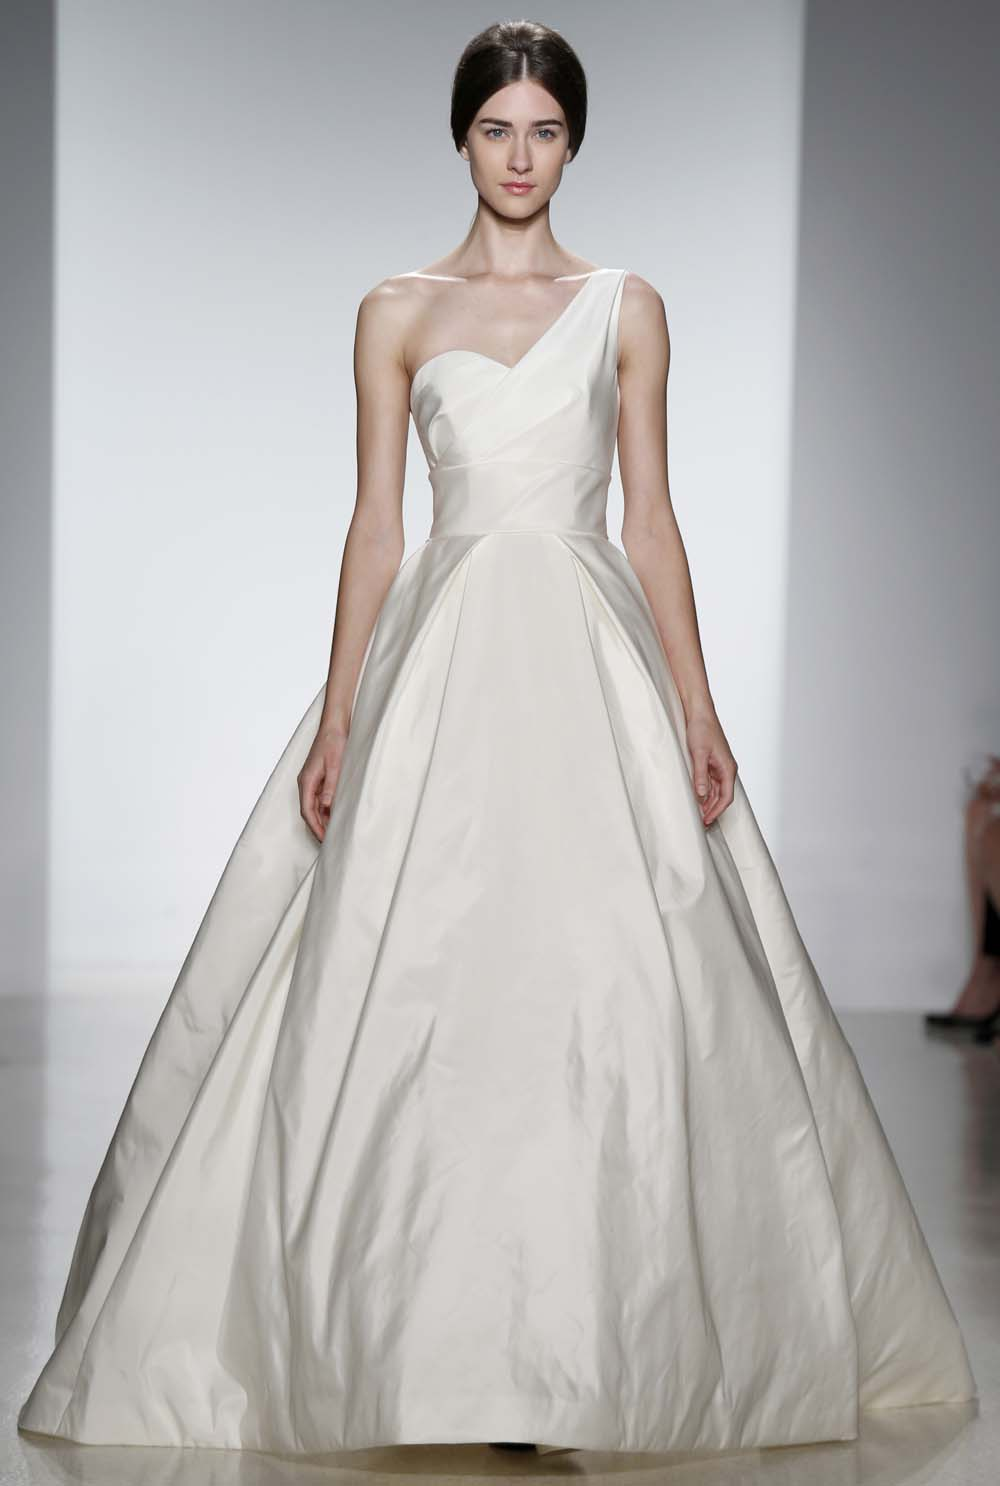 Wedding Dresses 2014 | Self Improvement